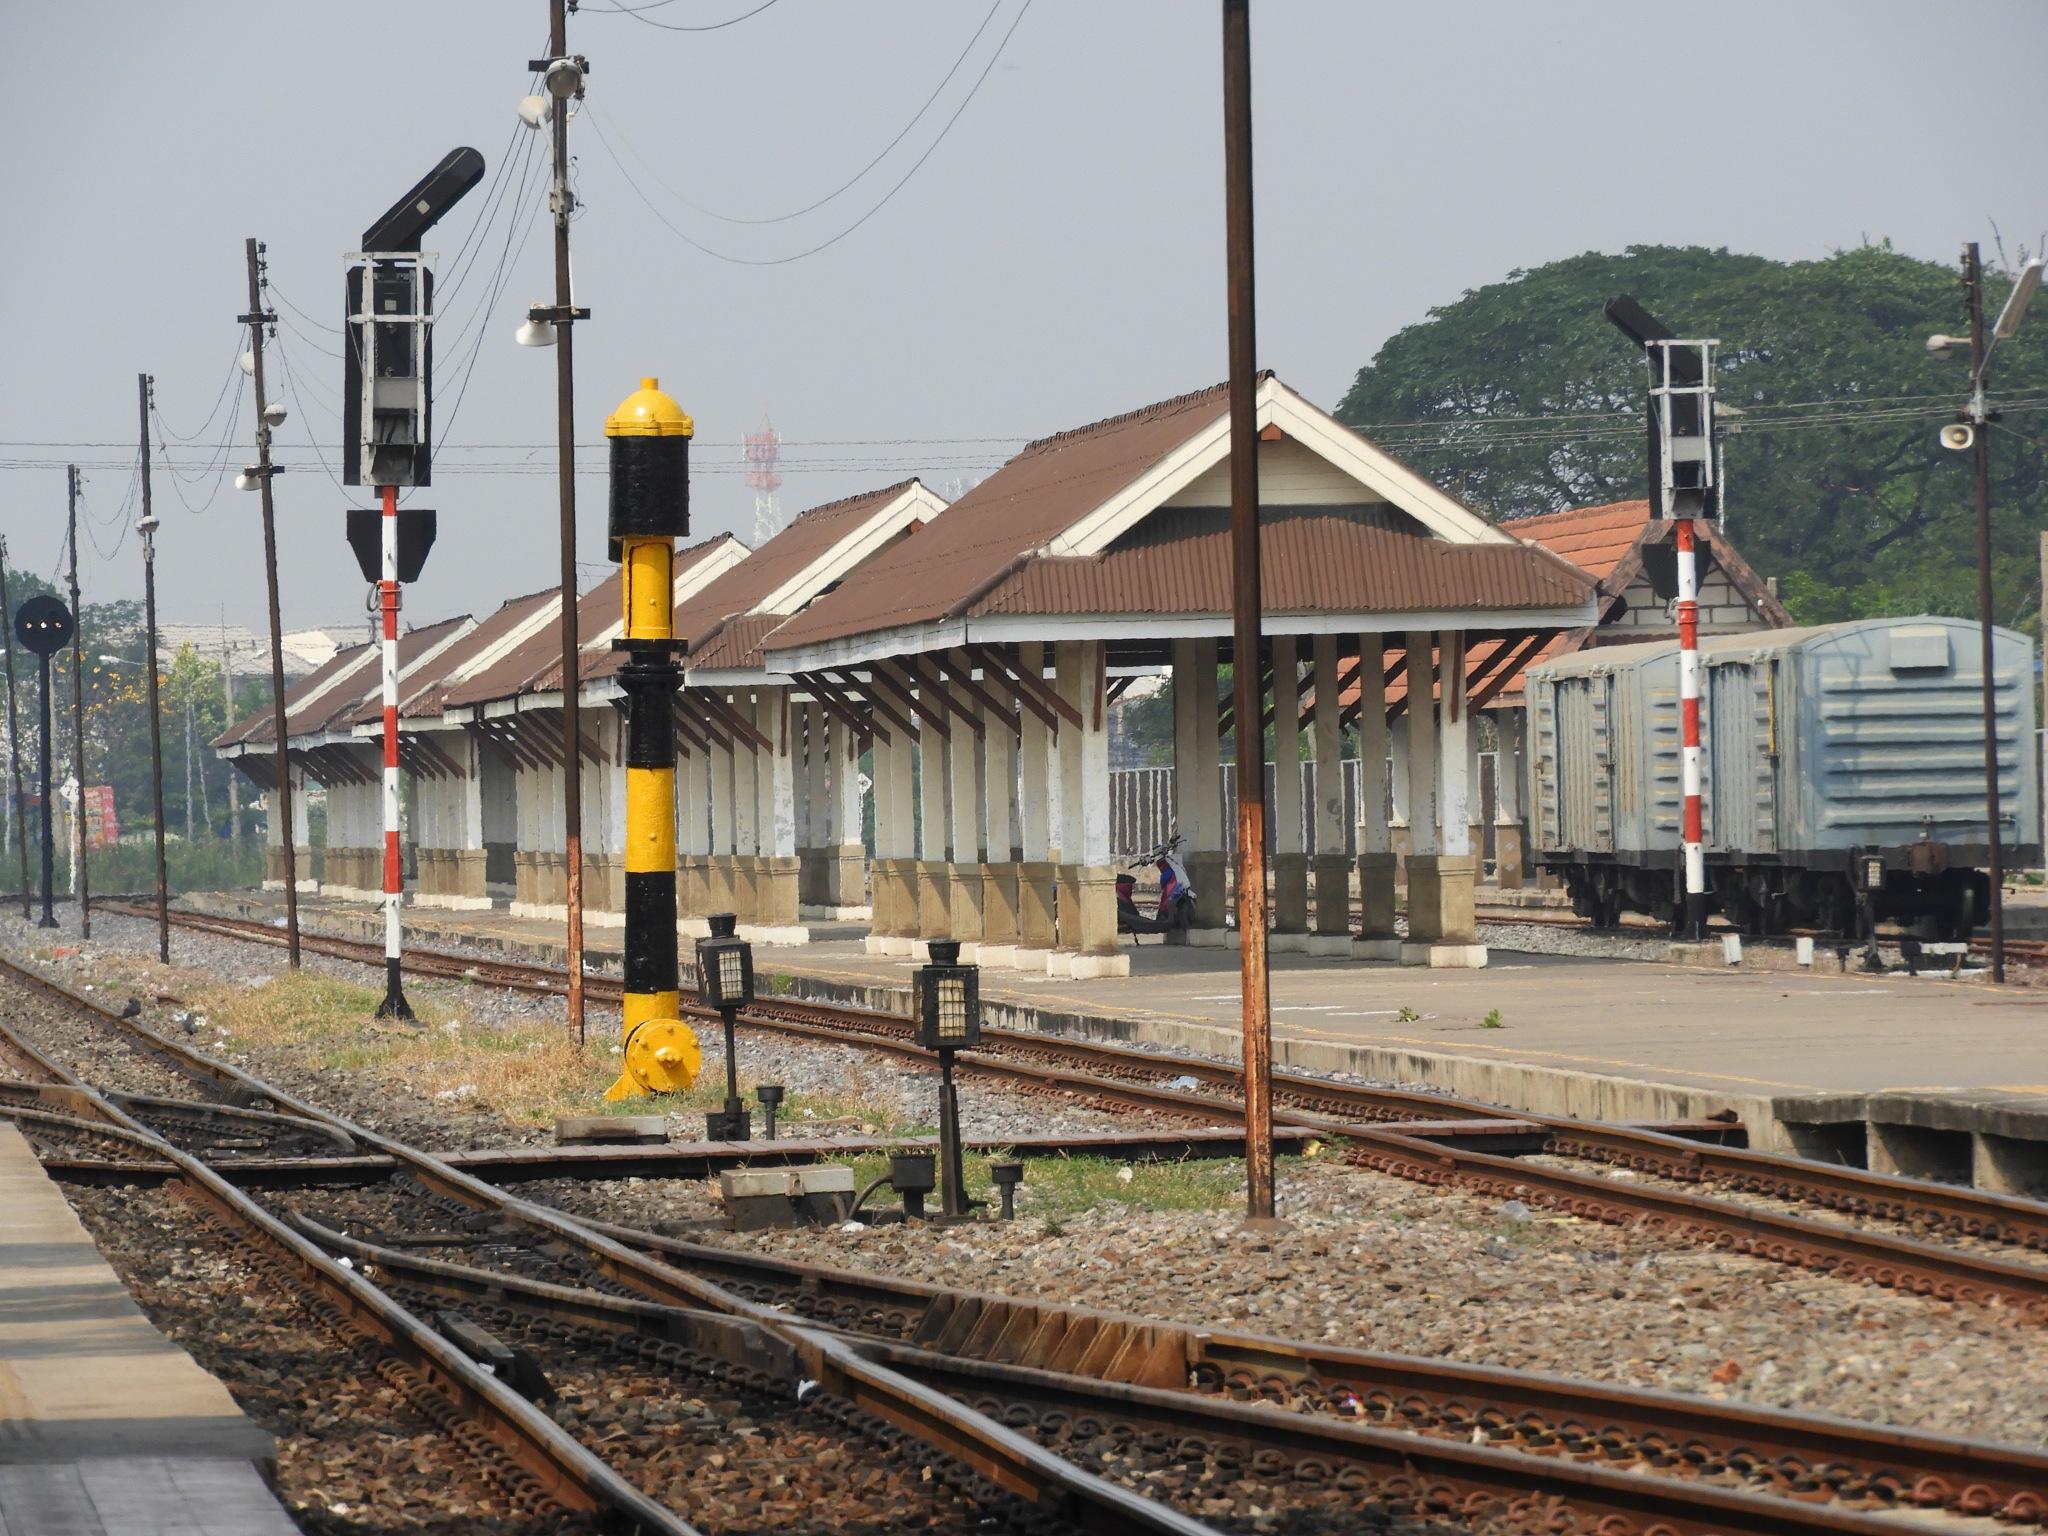 station by Henny van Broekhoven